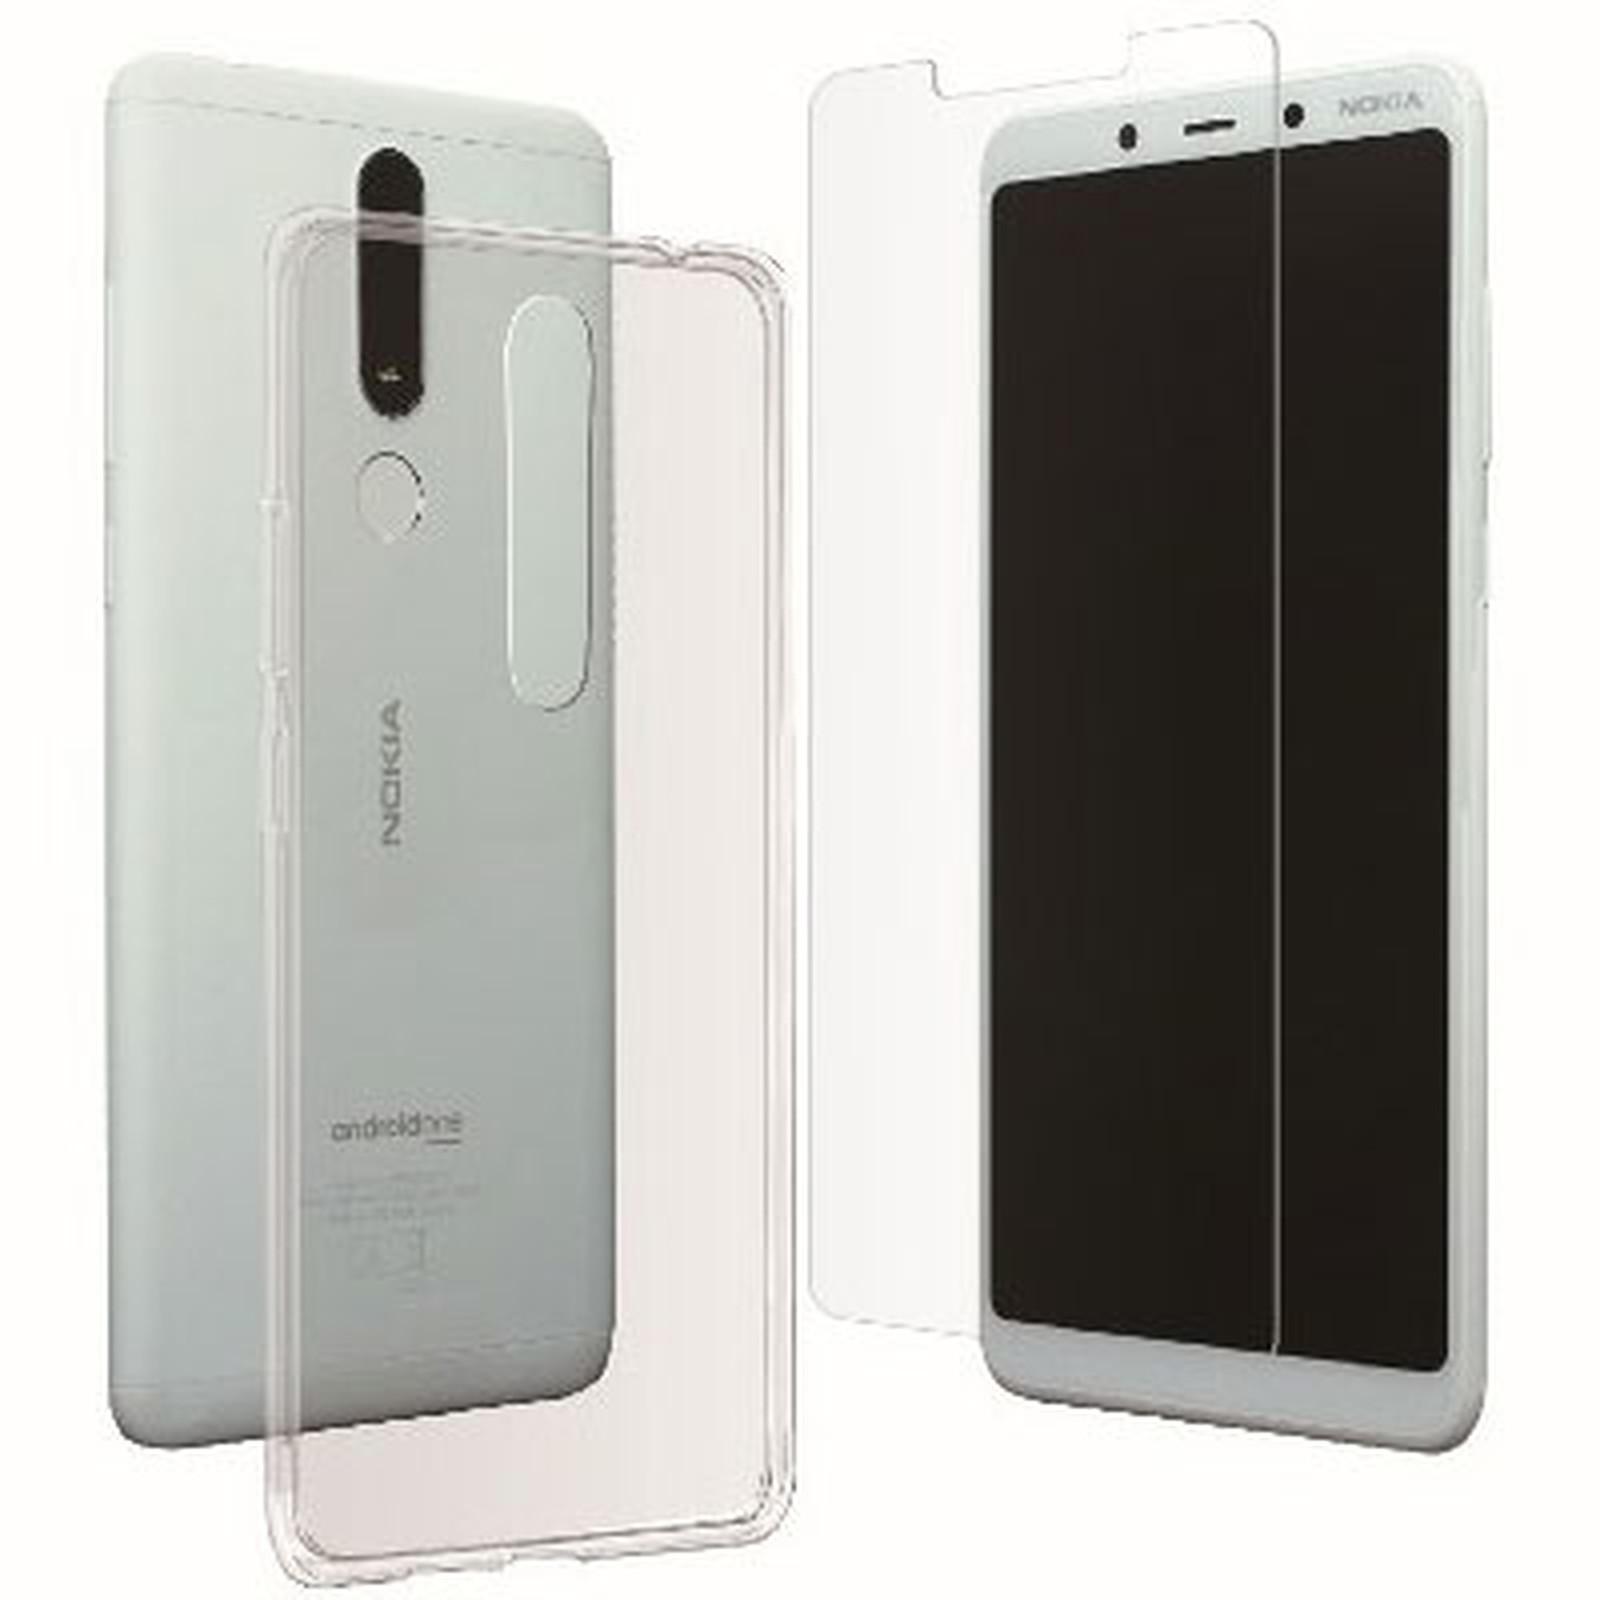 Muvit Pack Coque et Verre Trempé Nokia 3.1 Plus